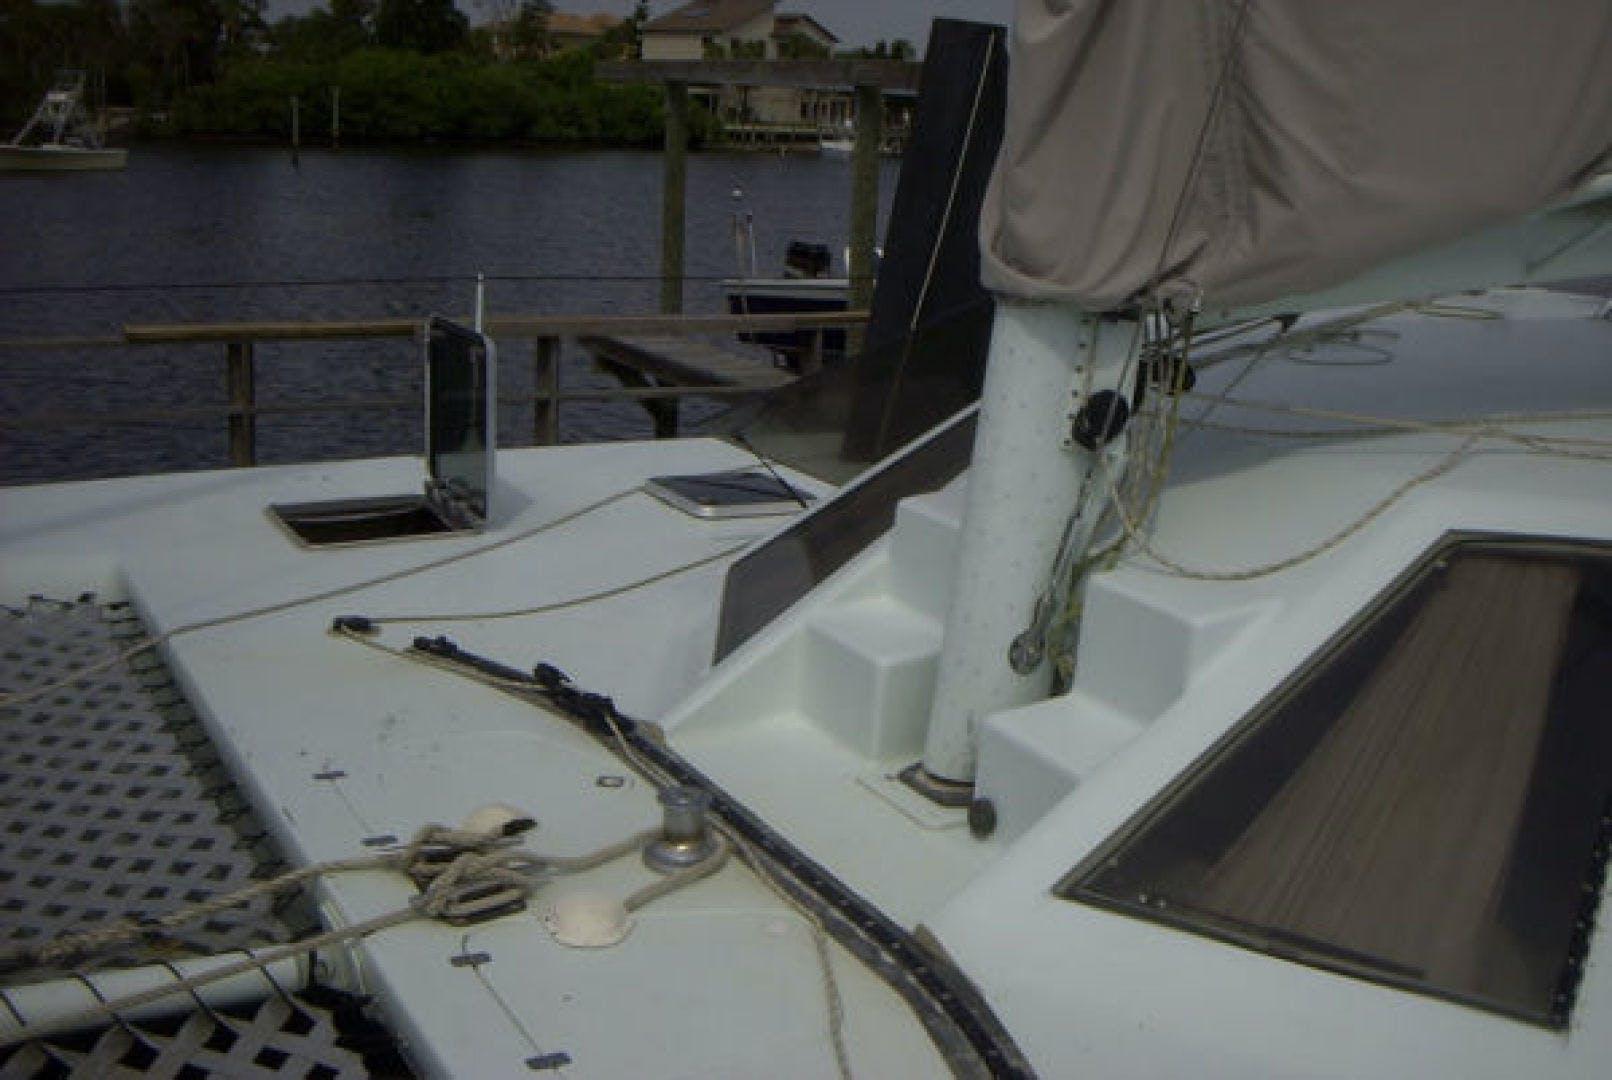 1999 Catamaran Custom Commercial Term Charter 60' Catamaran 60 No Name | Picture 4 of 16